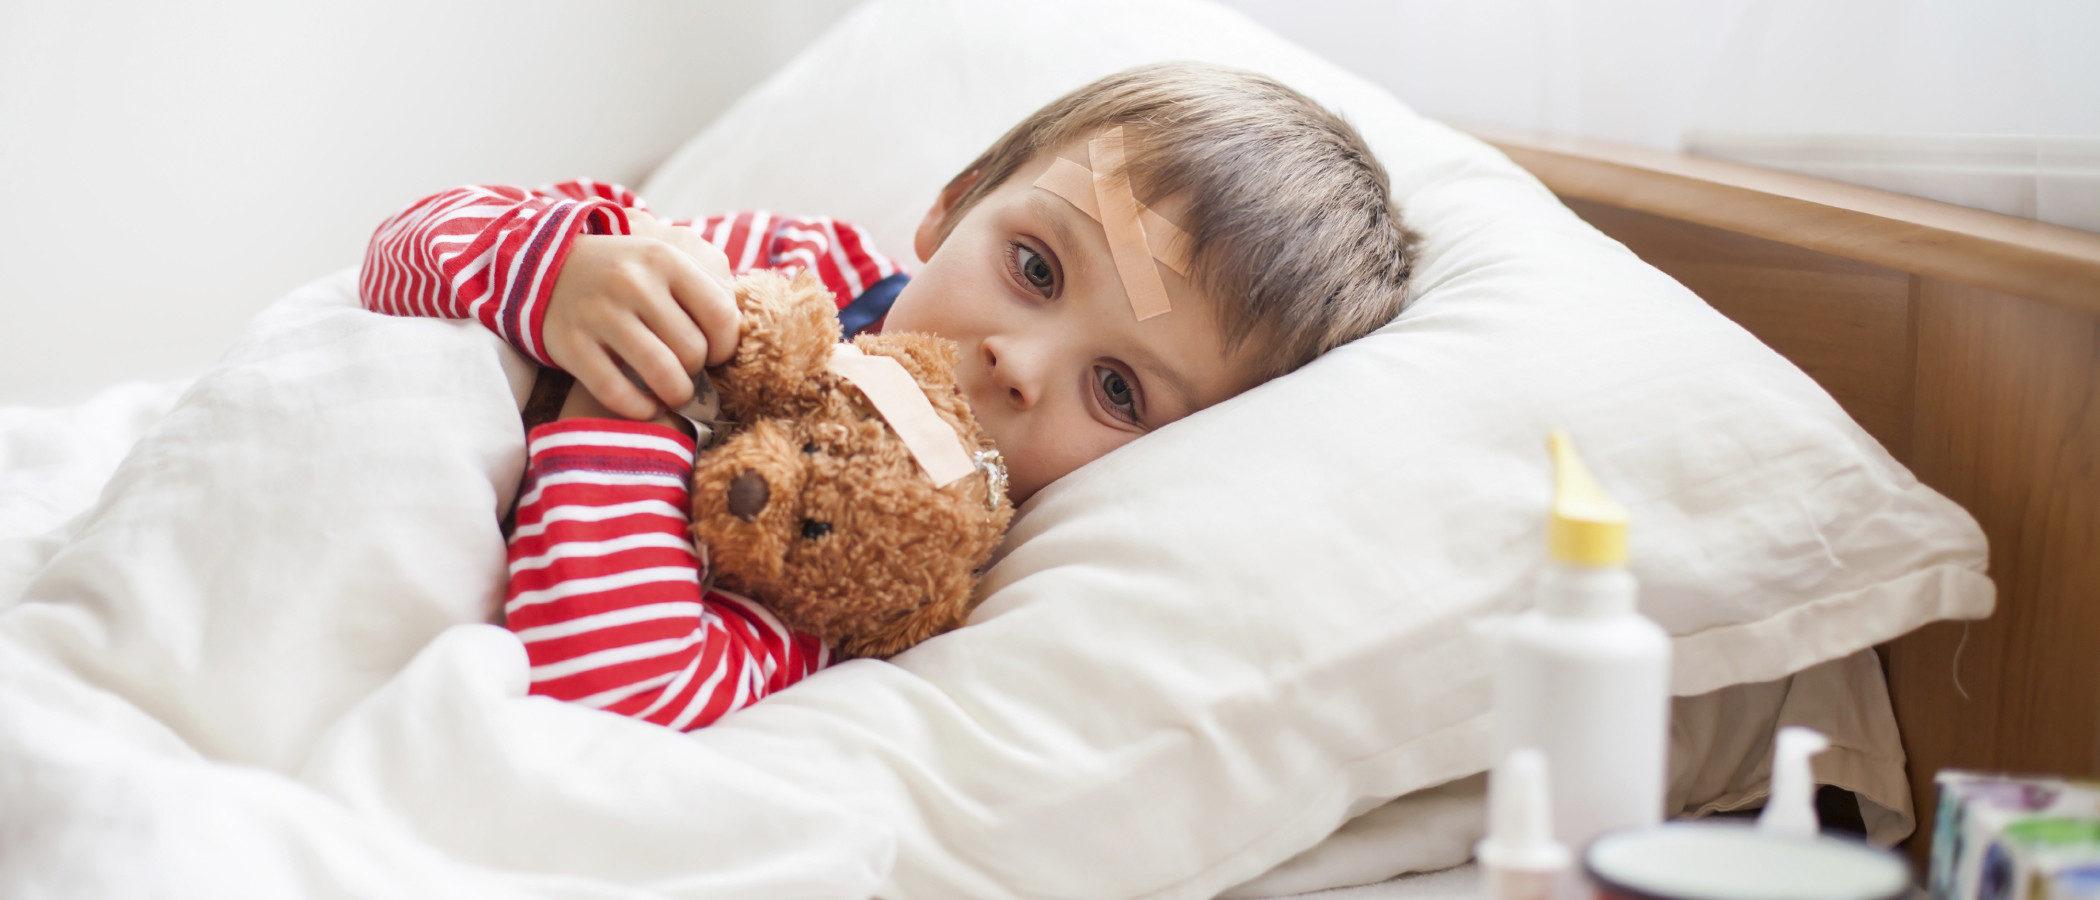 La gastroenteritis en niños